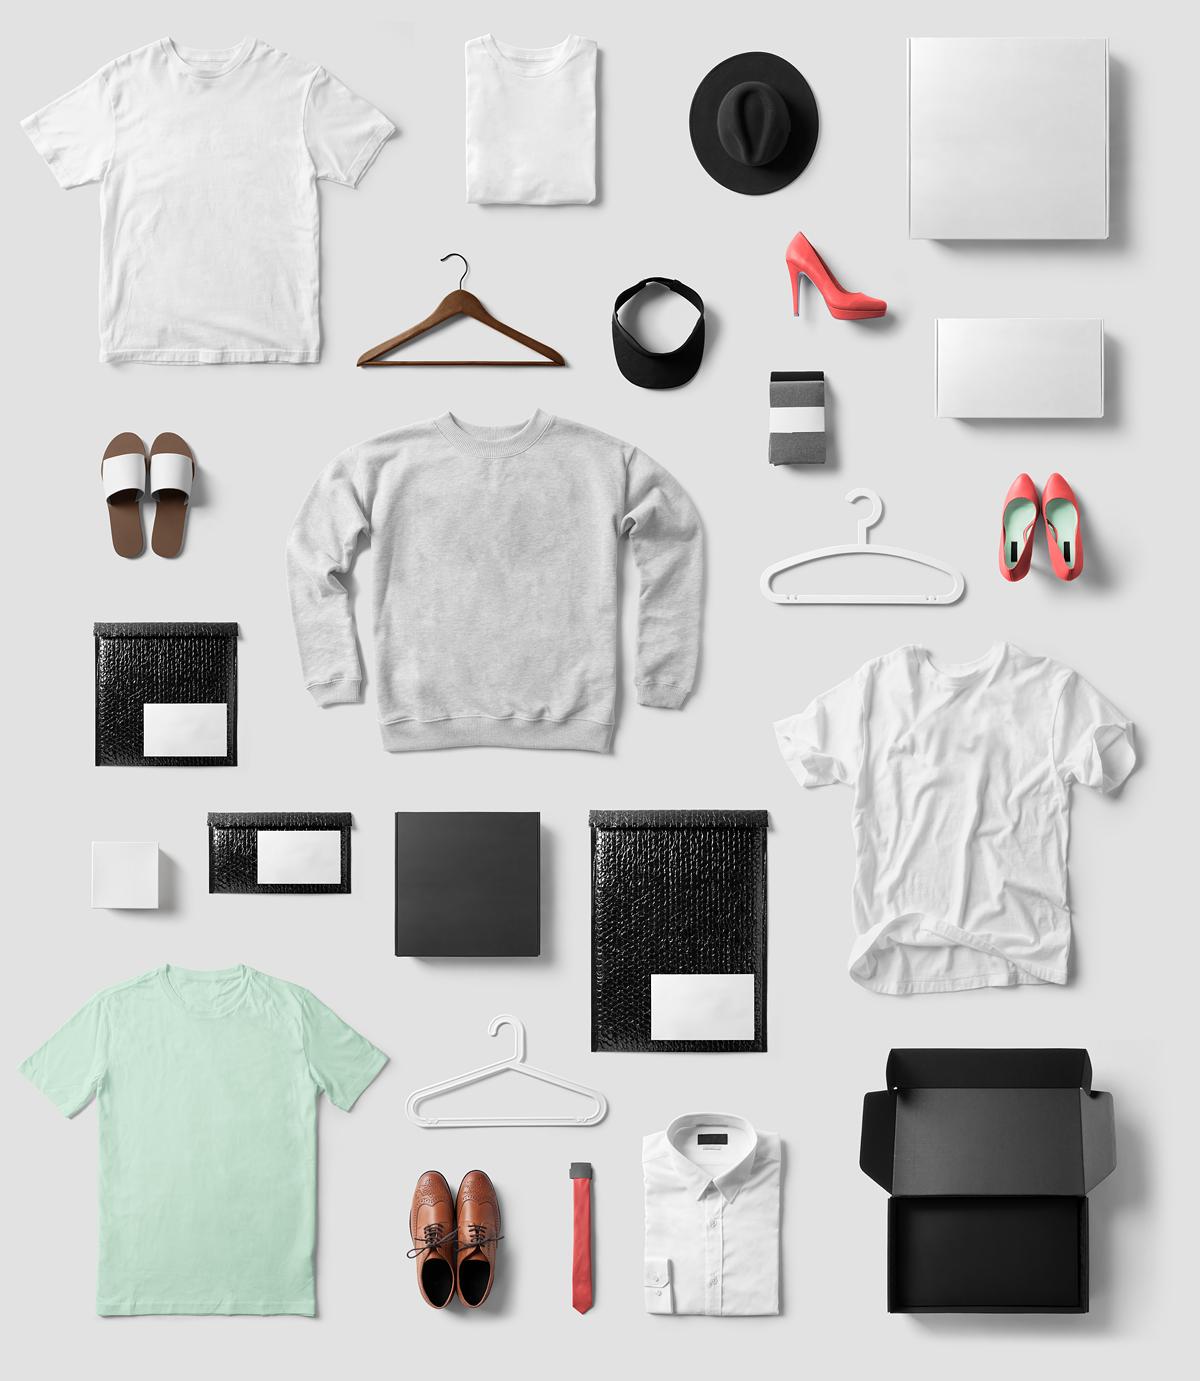 Fashion & T-Shirt PSD Mockup Based On Professional Photos